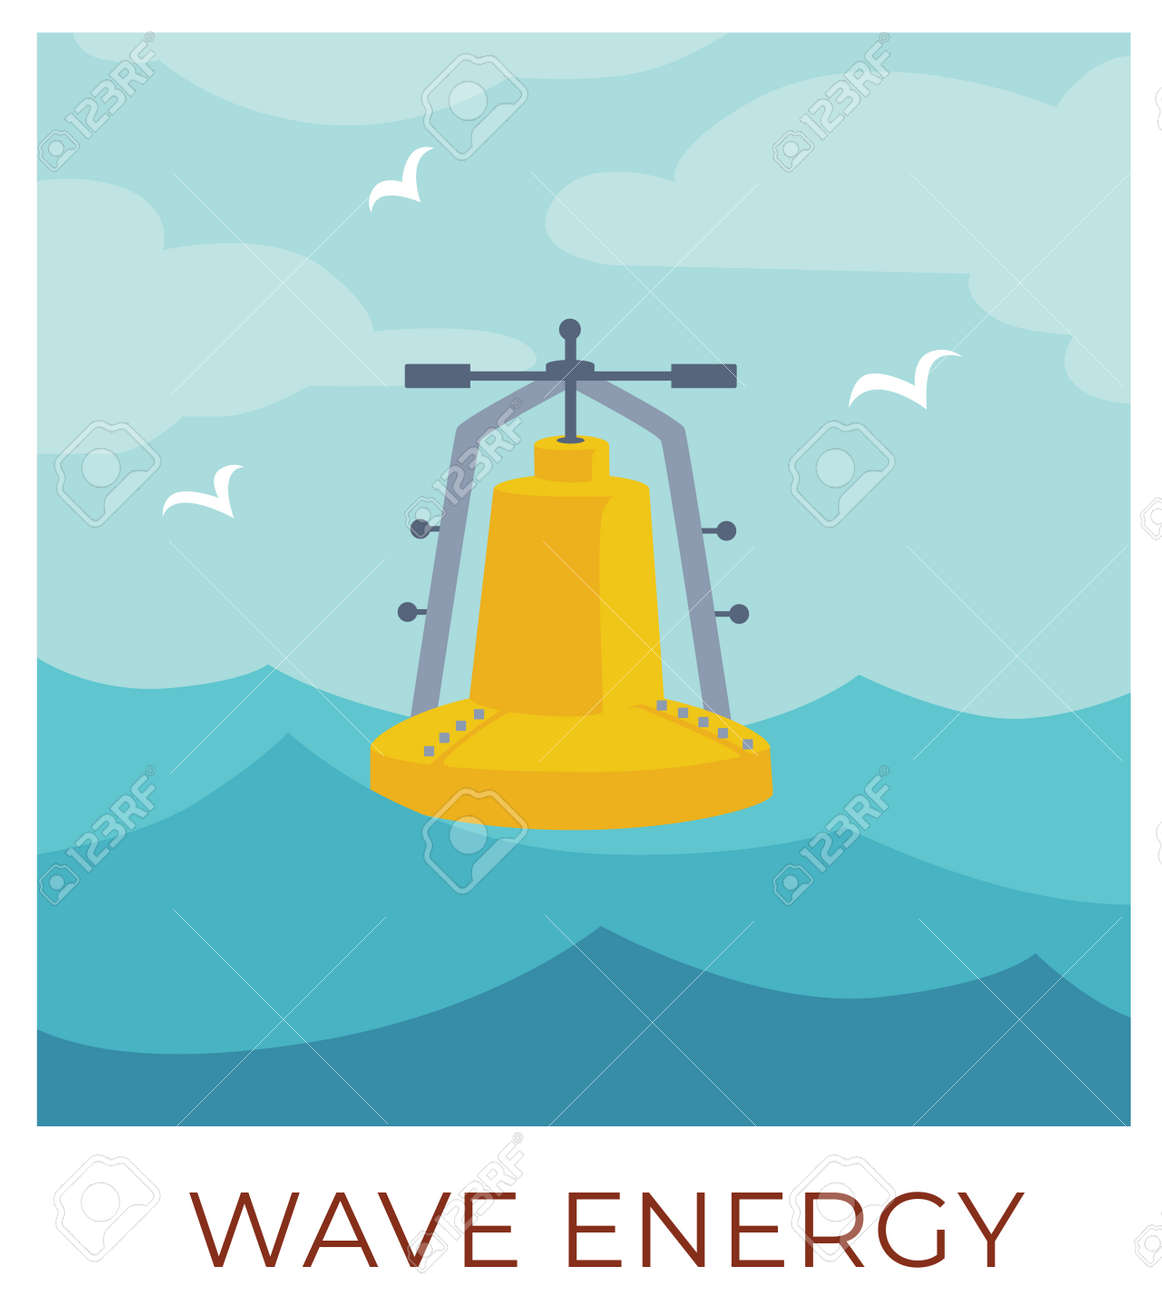 Wave energy sustainable renewable eco friendly resources vector - 157424351